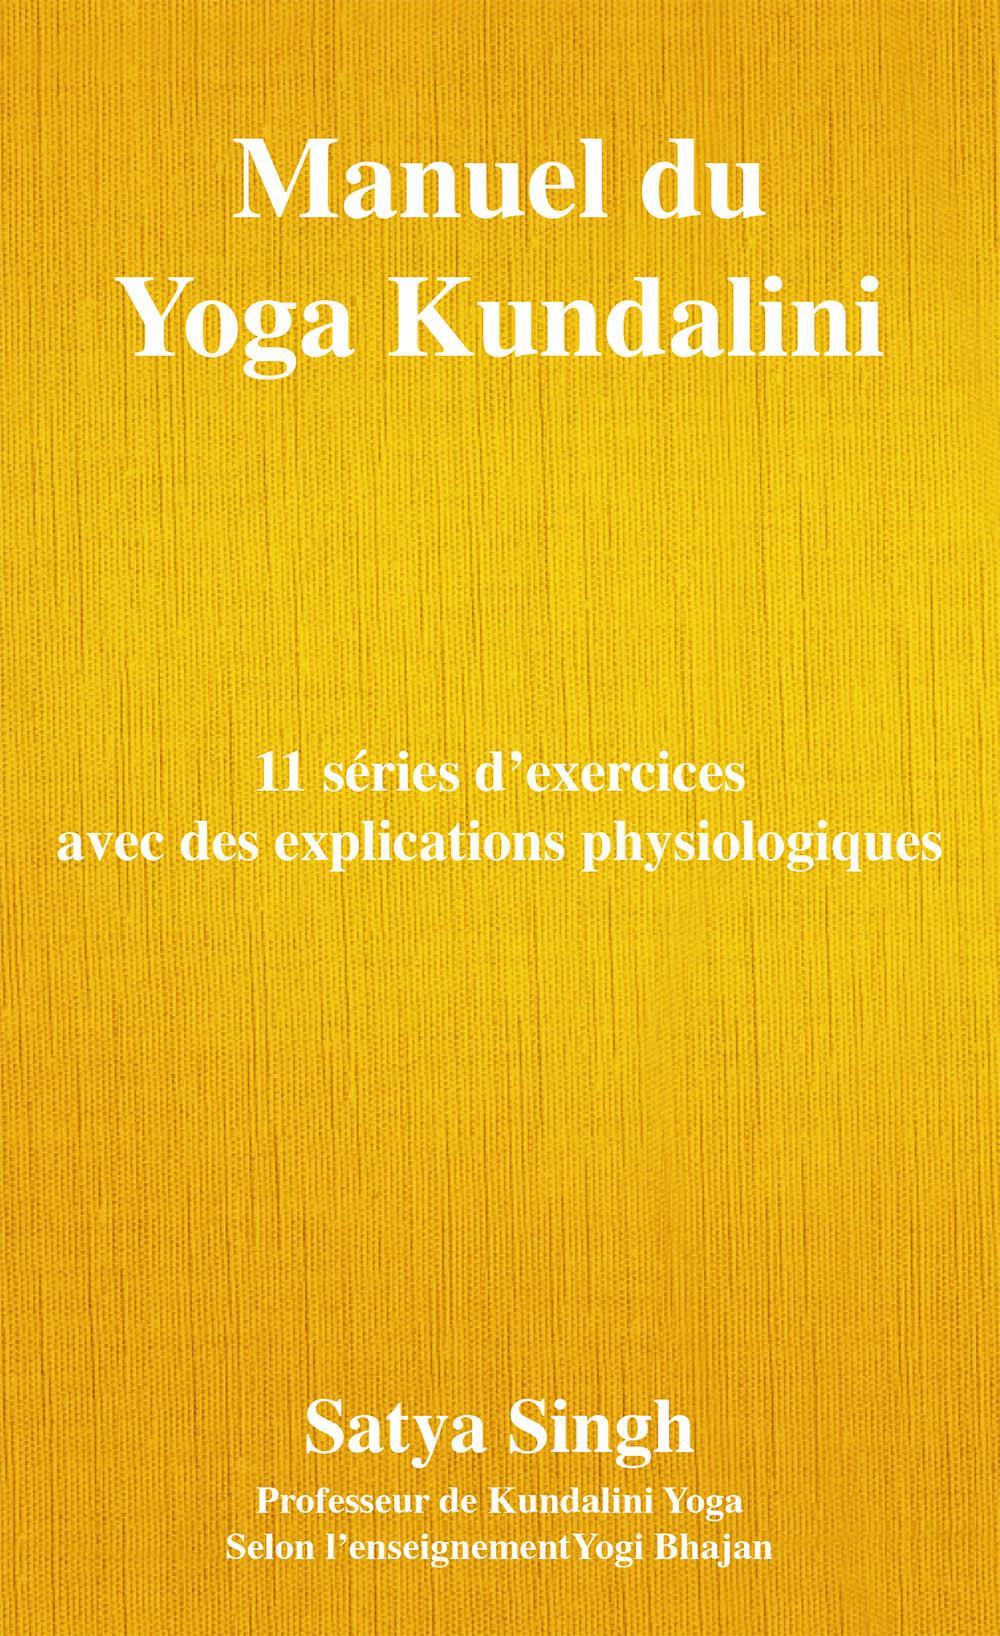 Manuel de Yoga Kundalini